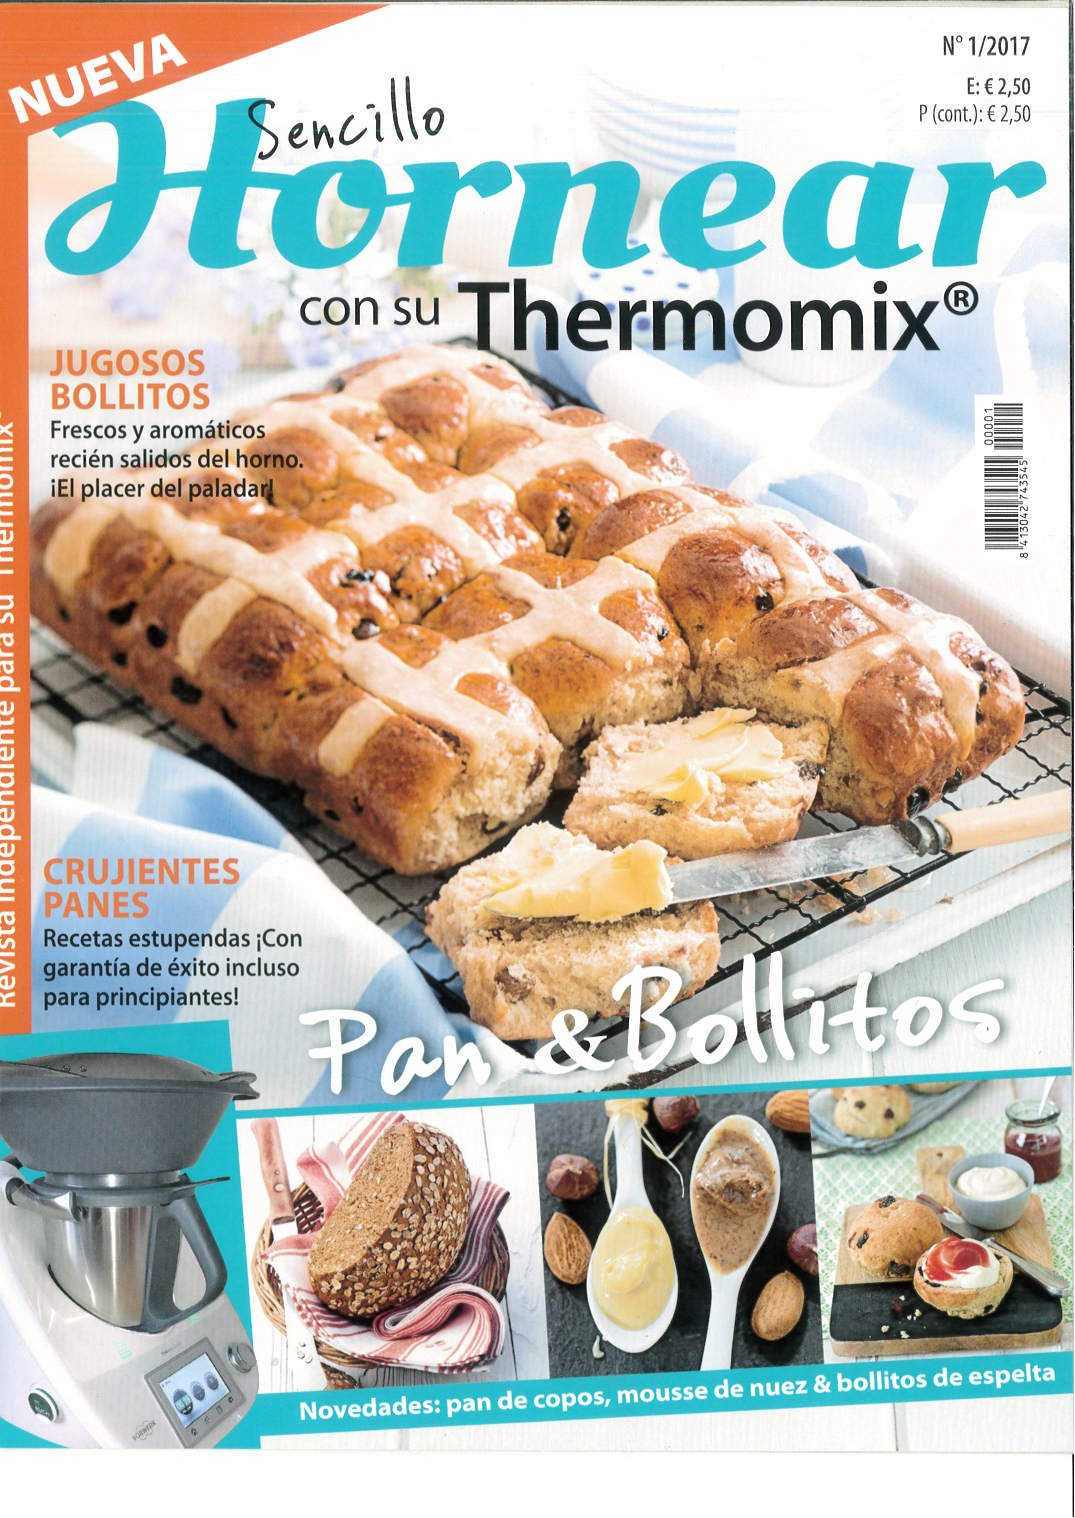 Pack: Cocinar con su Thermomix + Cocina Light + Sencillo Hornear. Mayo 2017 - Número 1: Amazon.es: Vv.Aa: Libros